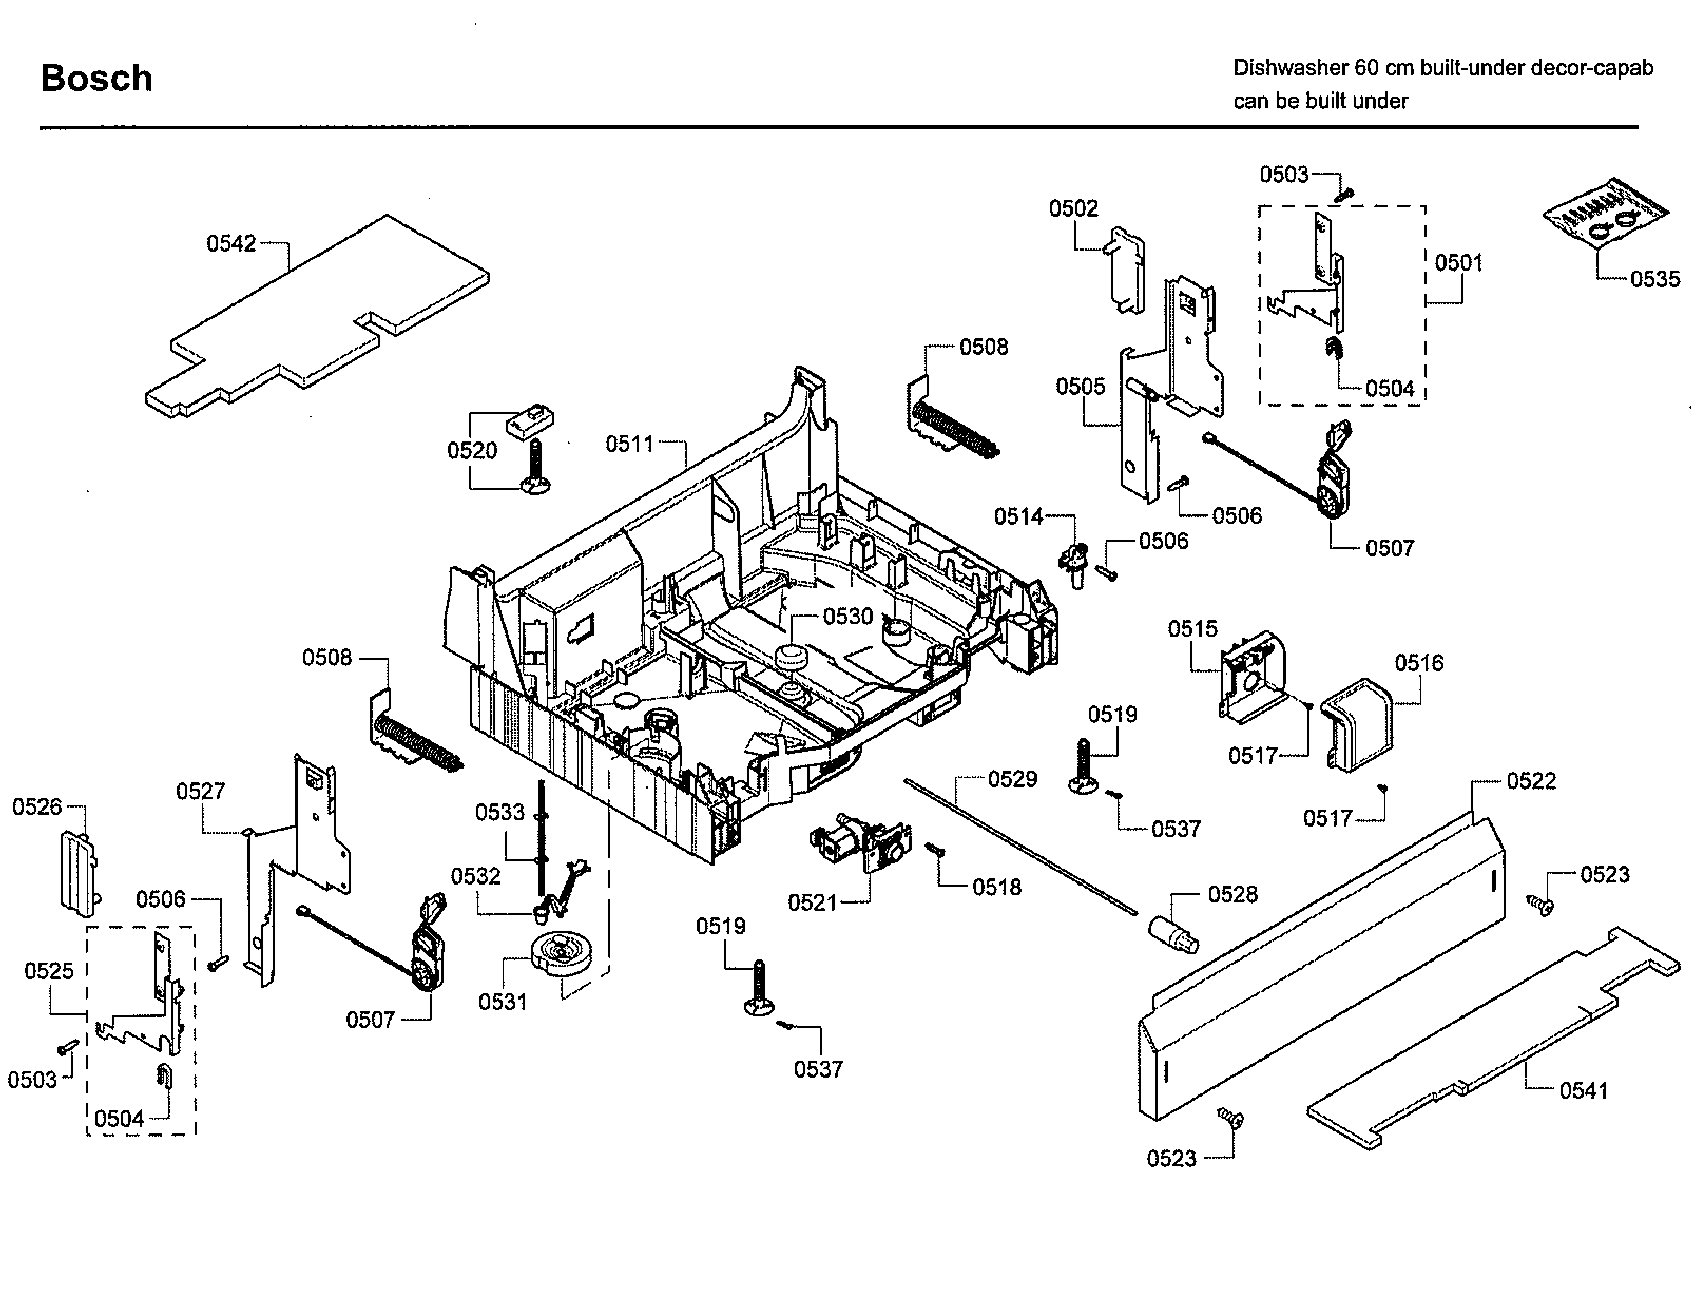 Bosch model SHE43RL5UC/64 dishwasher genuine parts